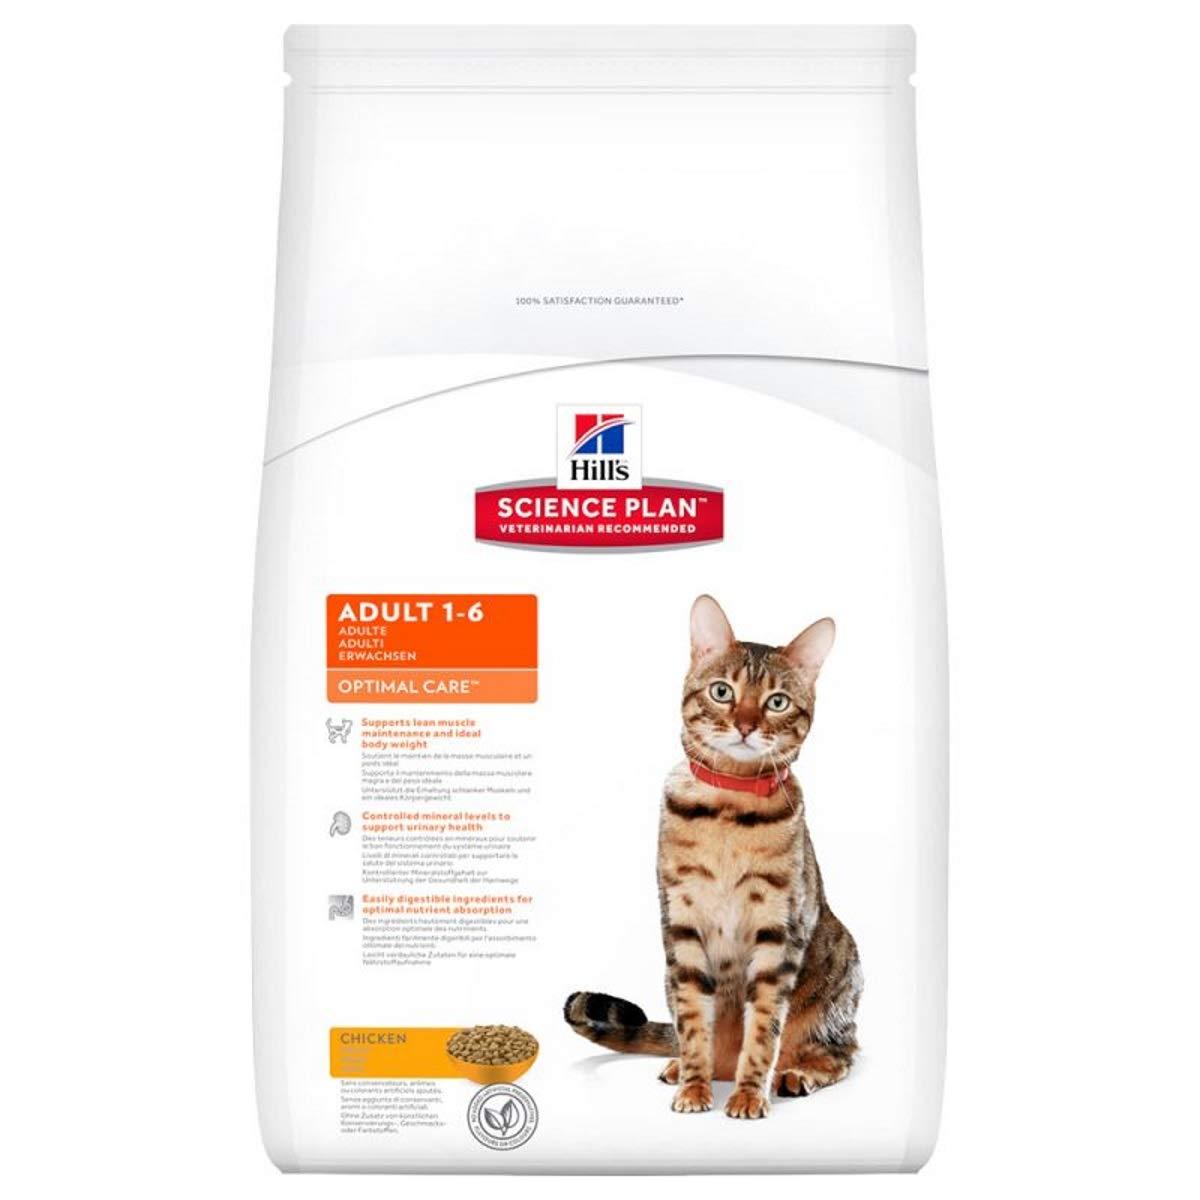 Hills Science Plan Hills Cat Food Adult